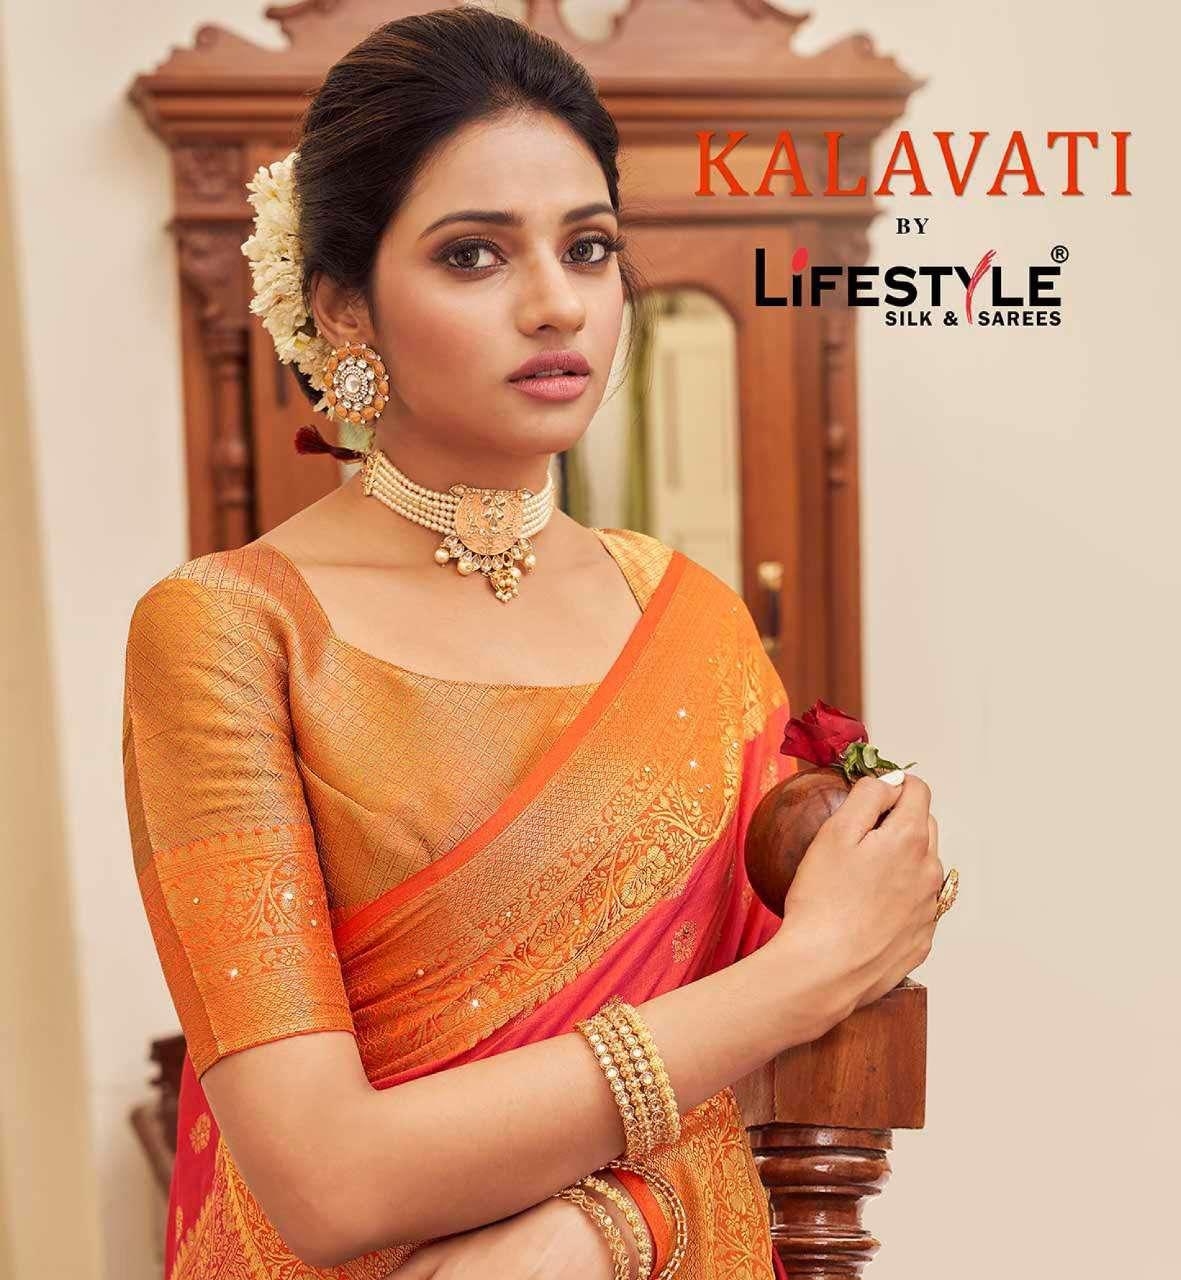 Lifestyle Kalavati Exclusive Sana Silk Saree Catalog Wholesale Dealer